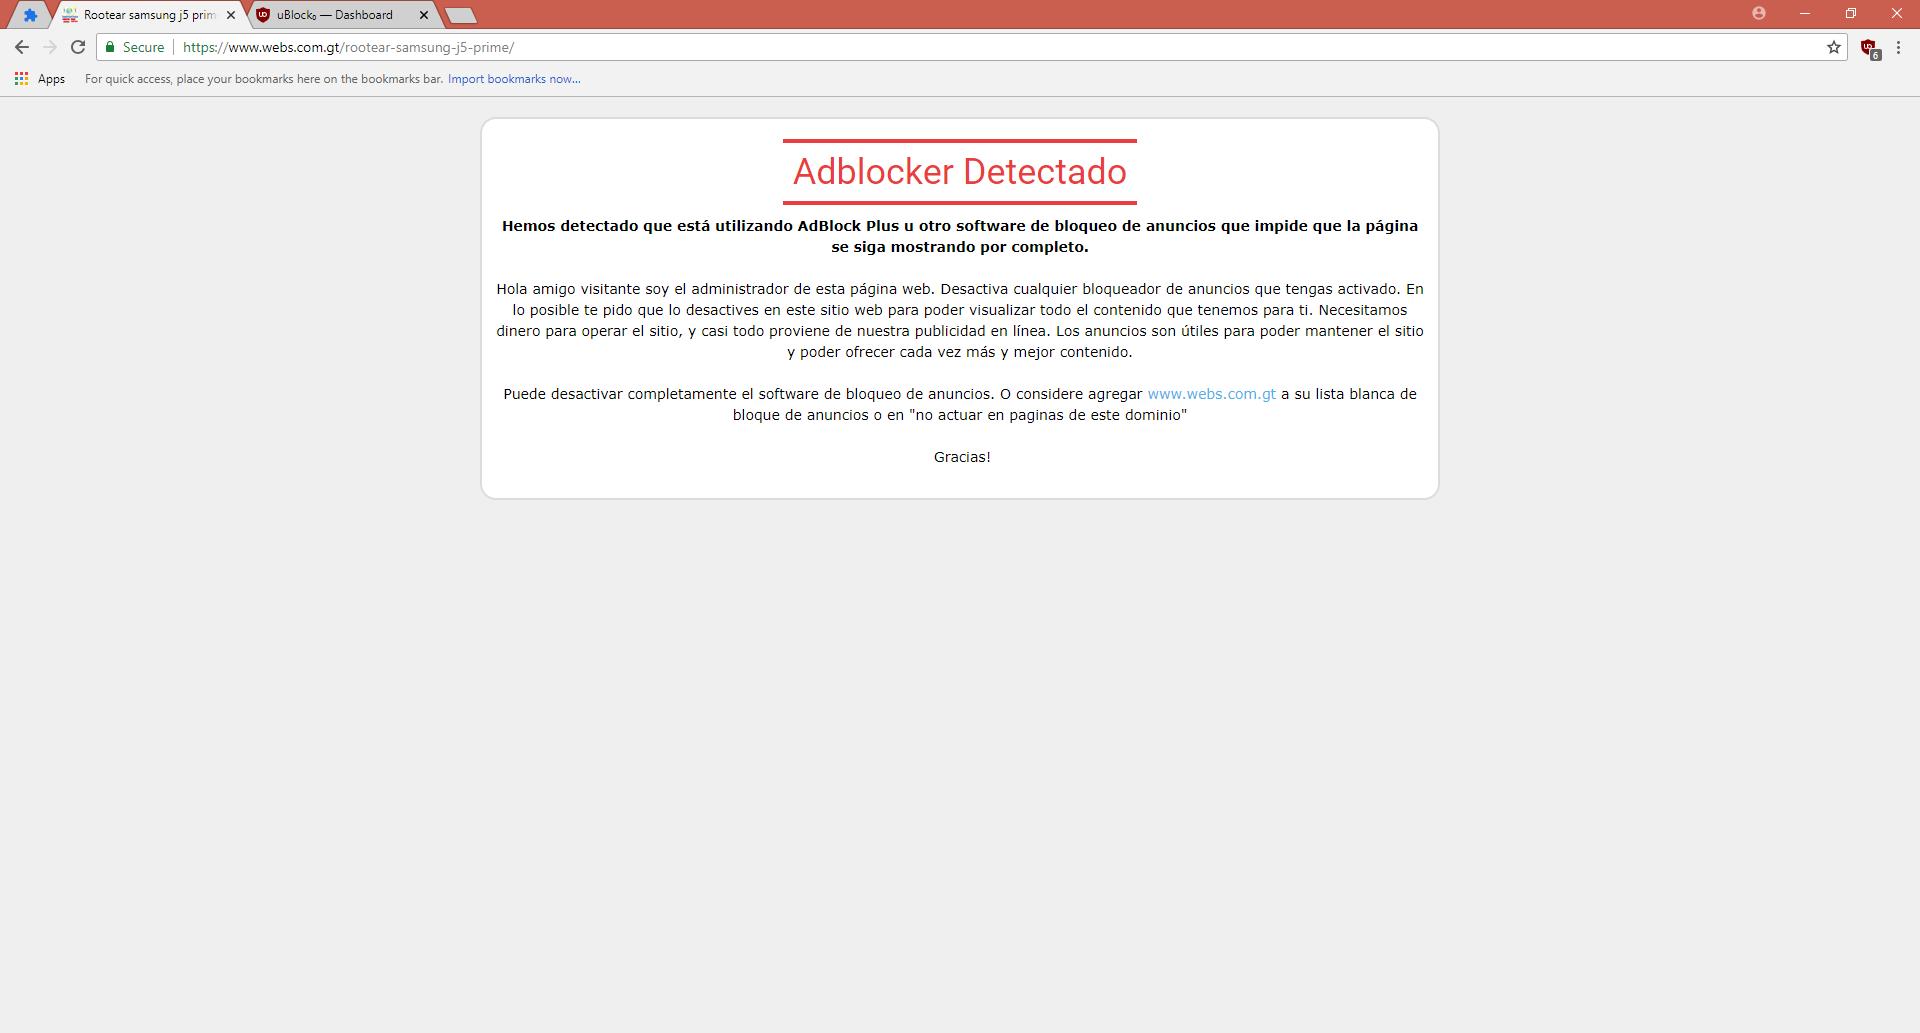 Anti-adblock] webs com gt · Issue #2658 · uBlockOrigin